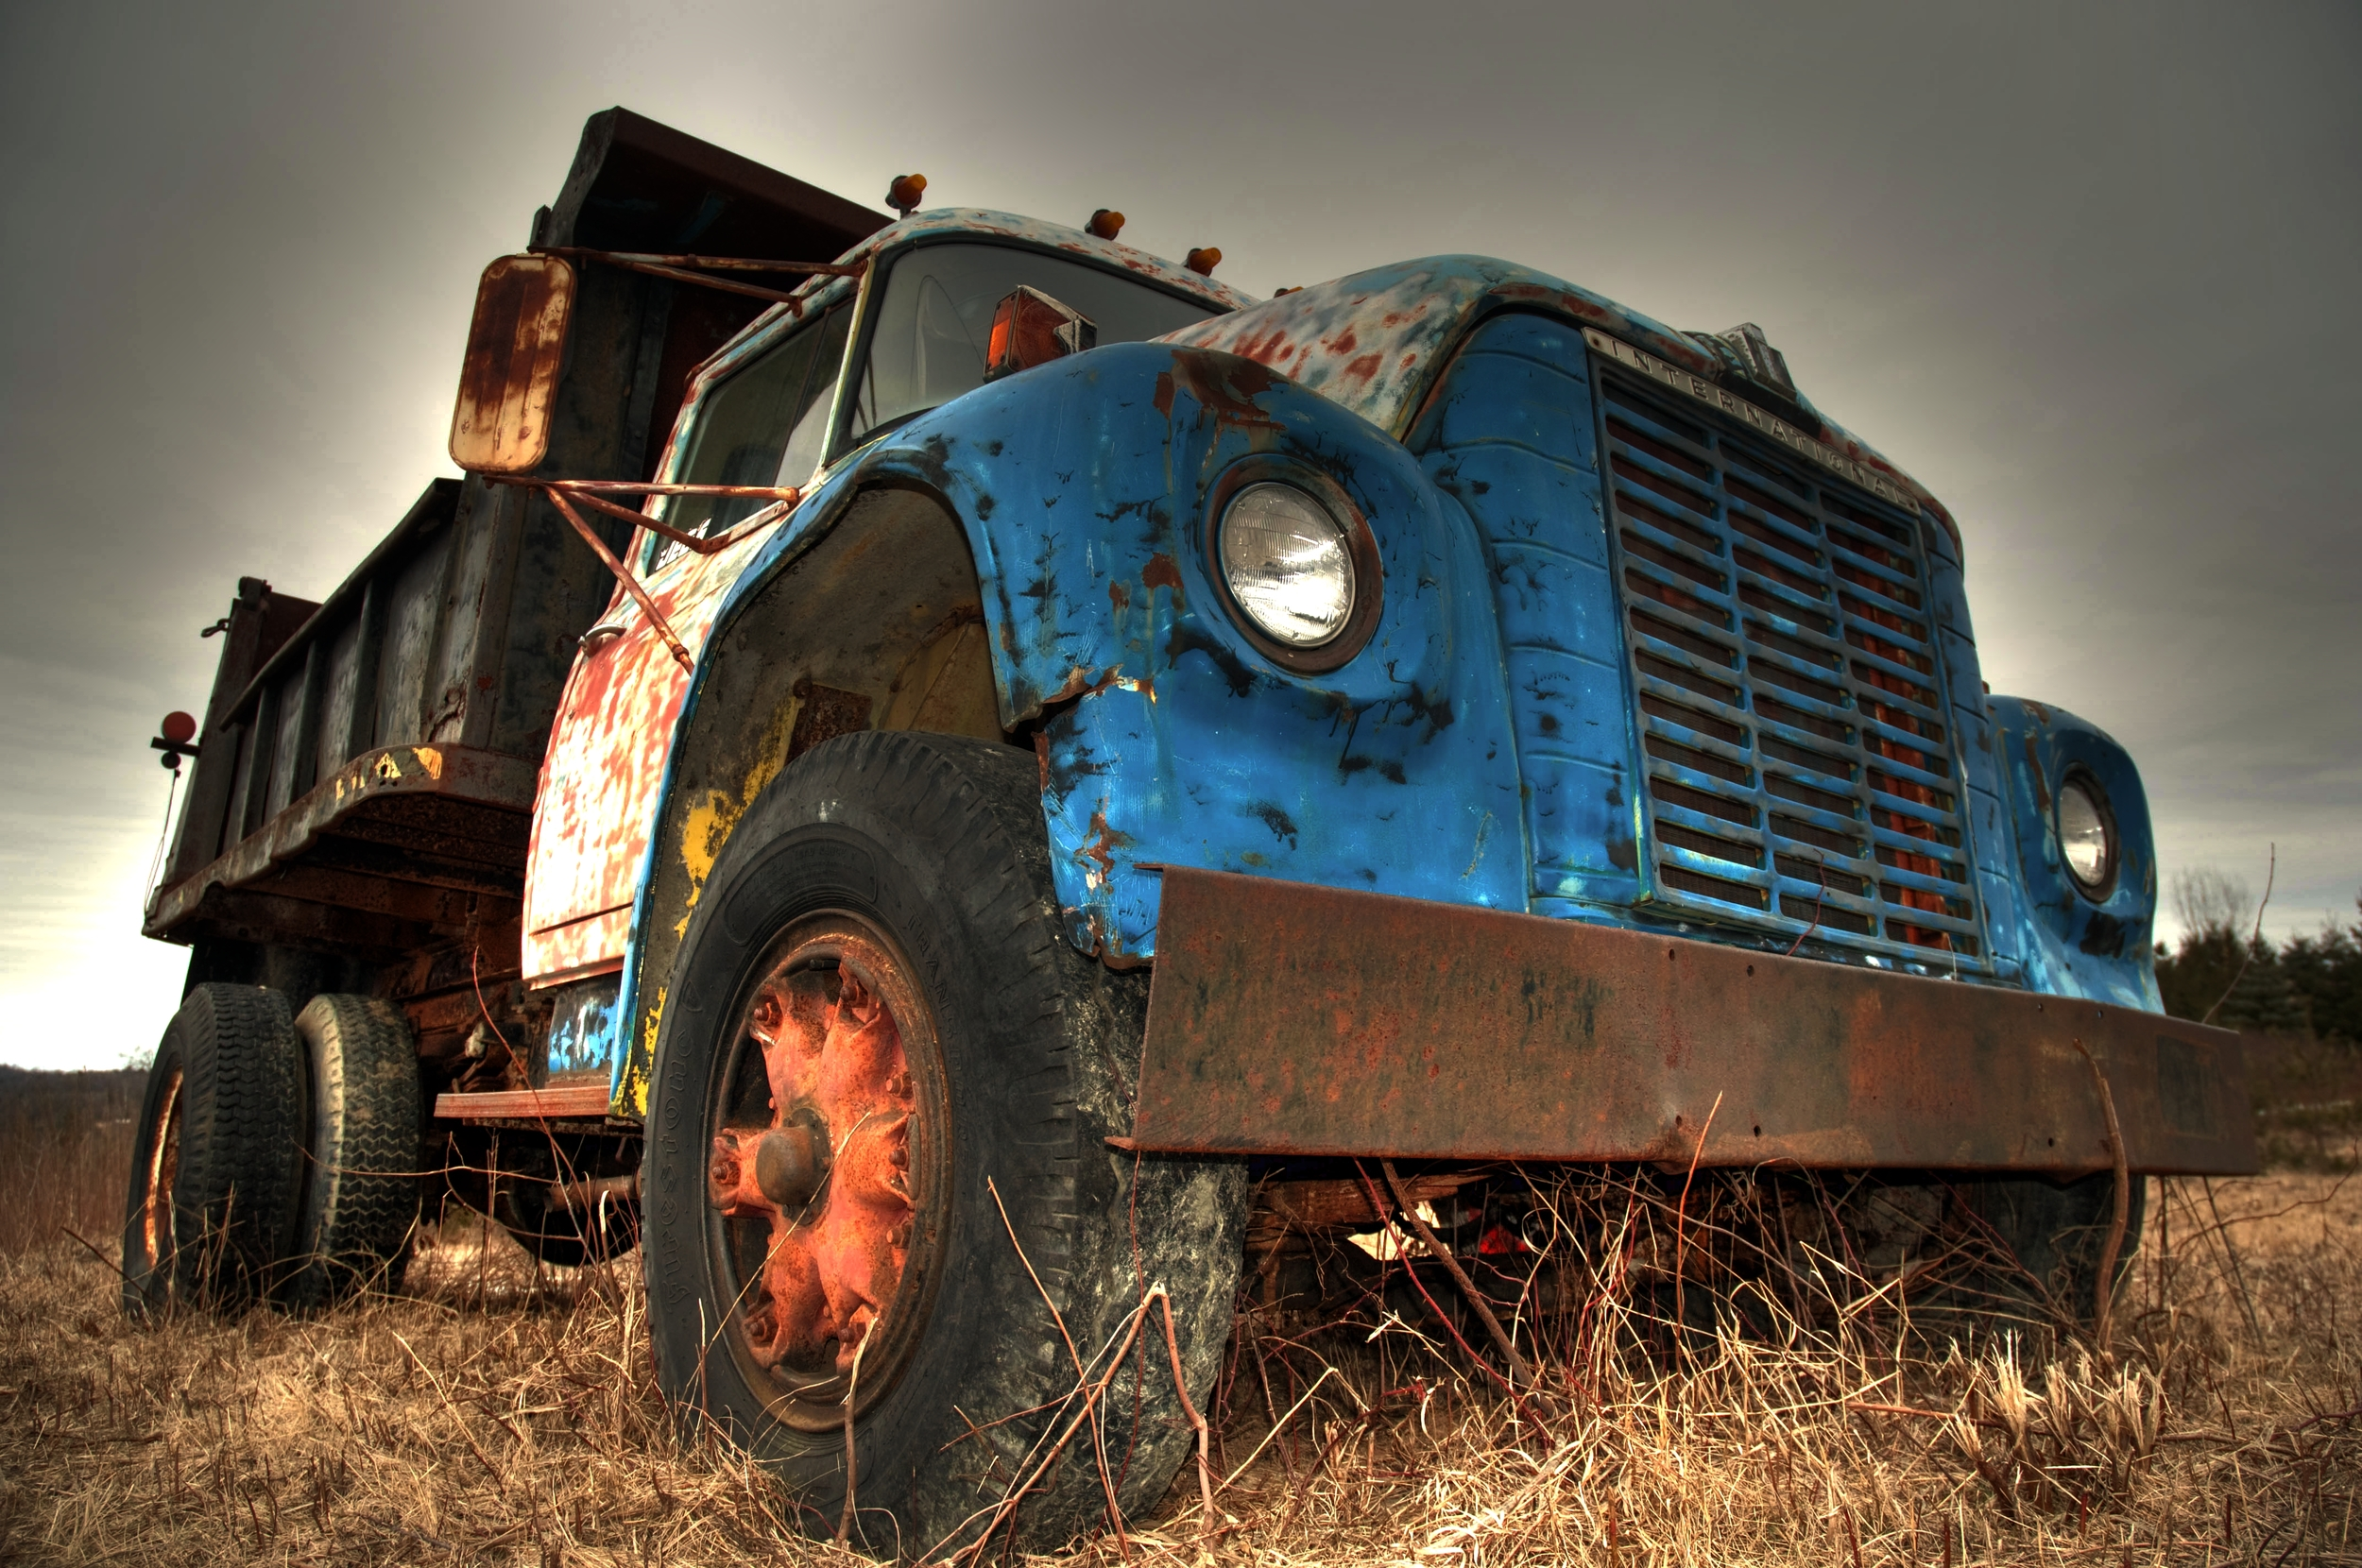 vermont-truck-HDR.jpg